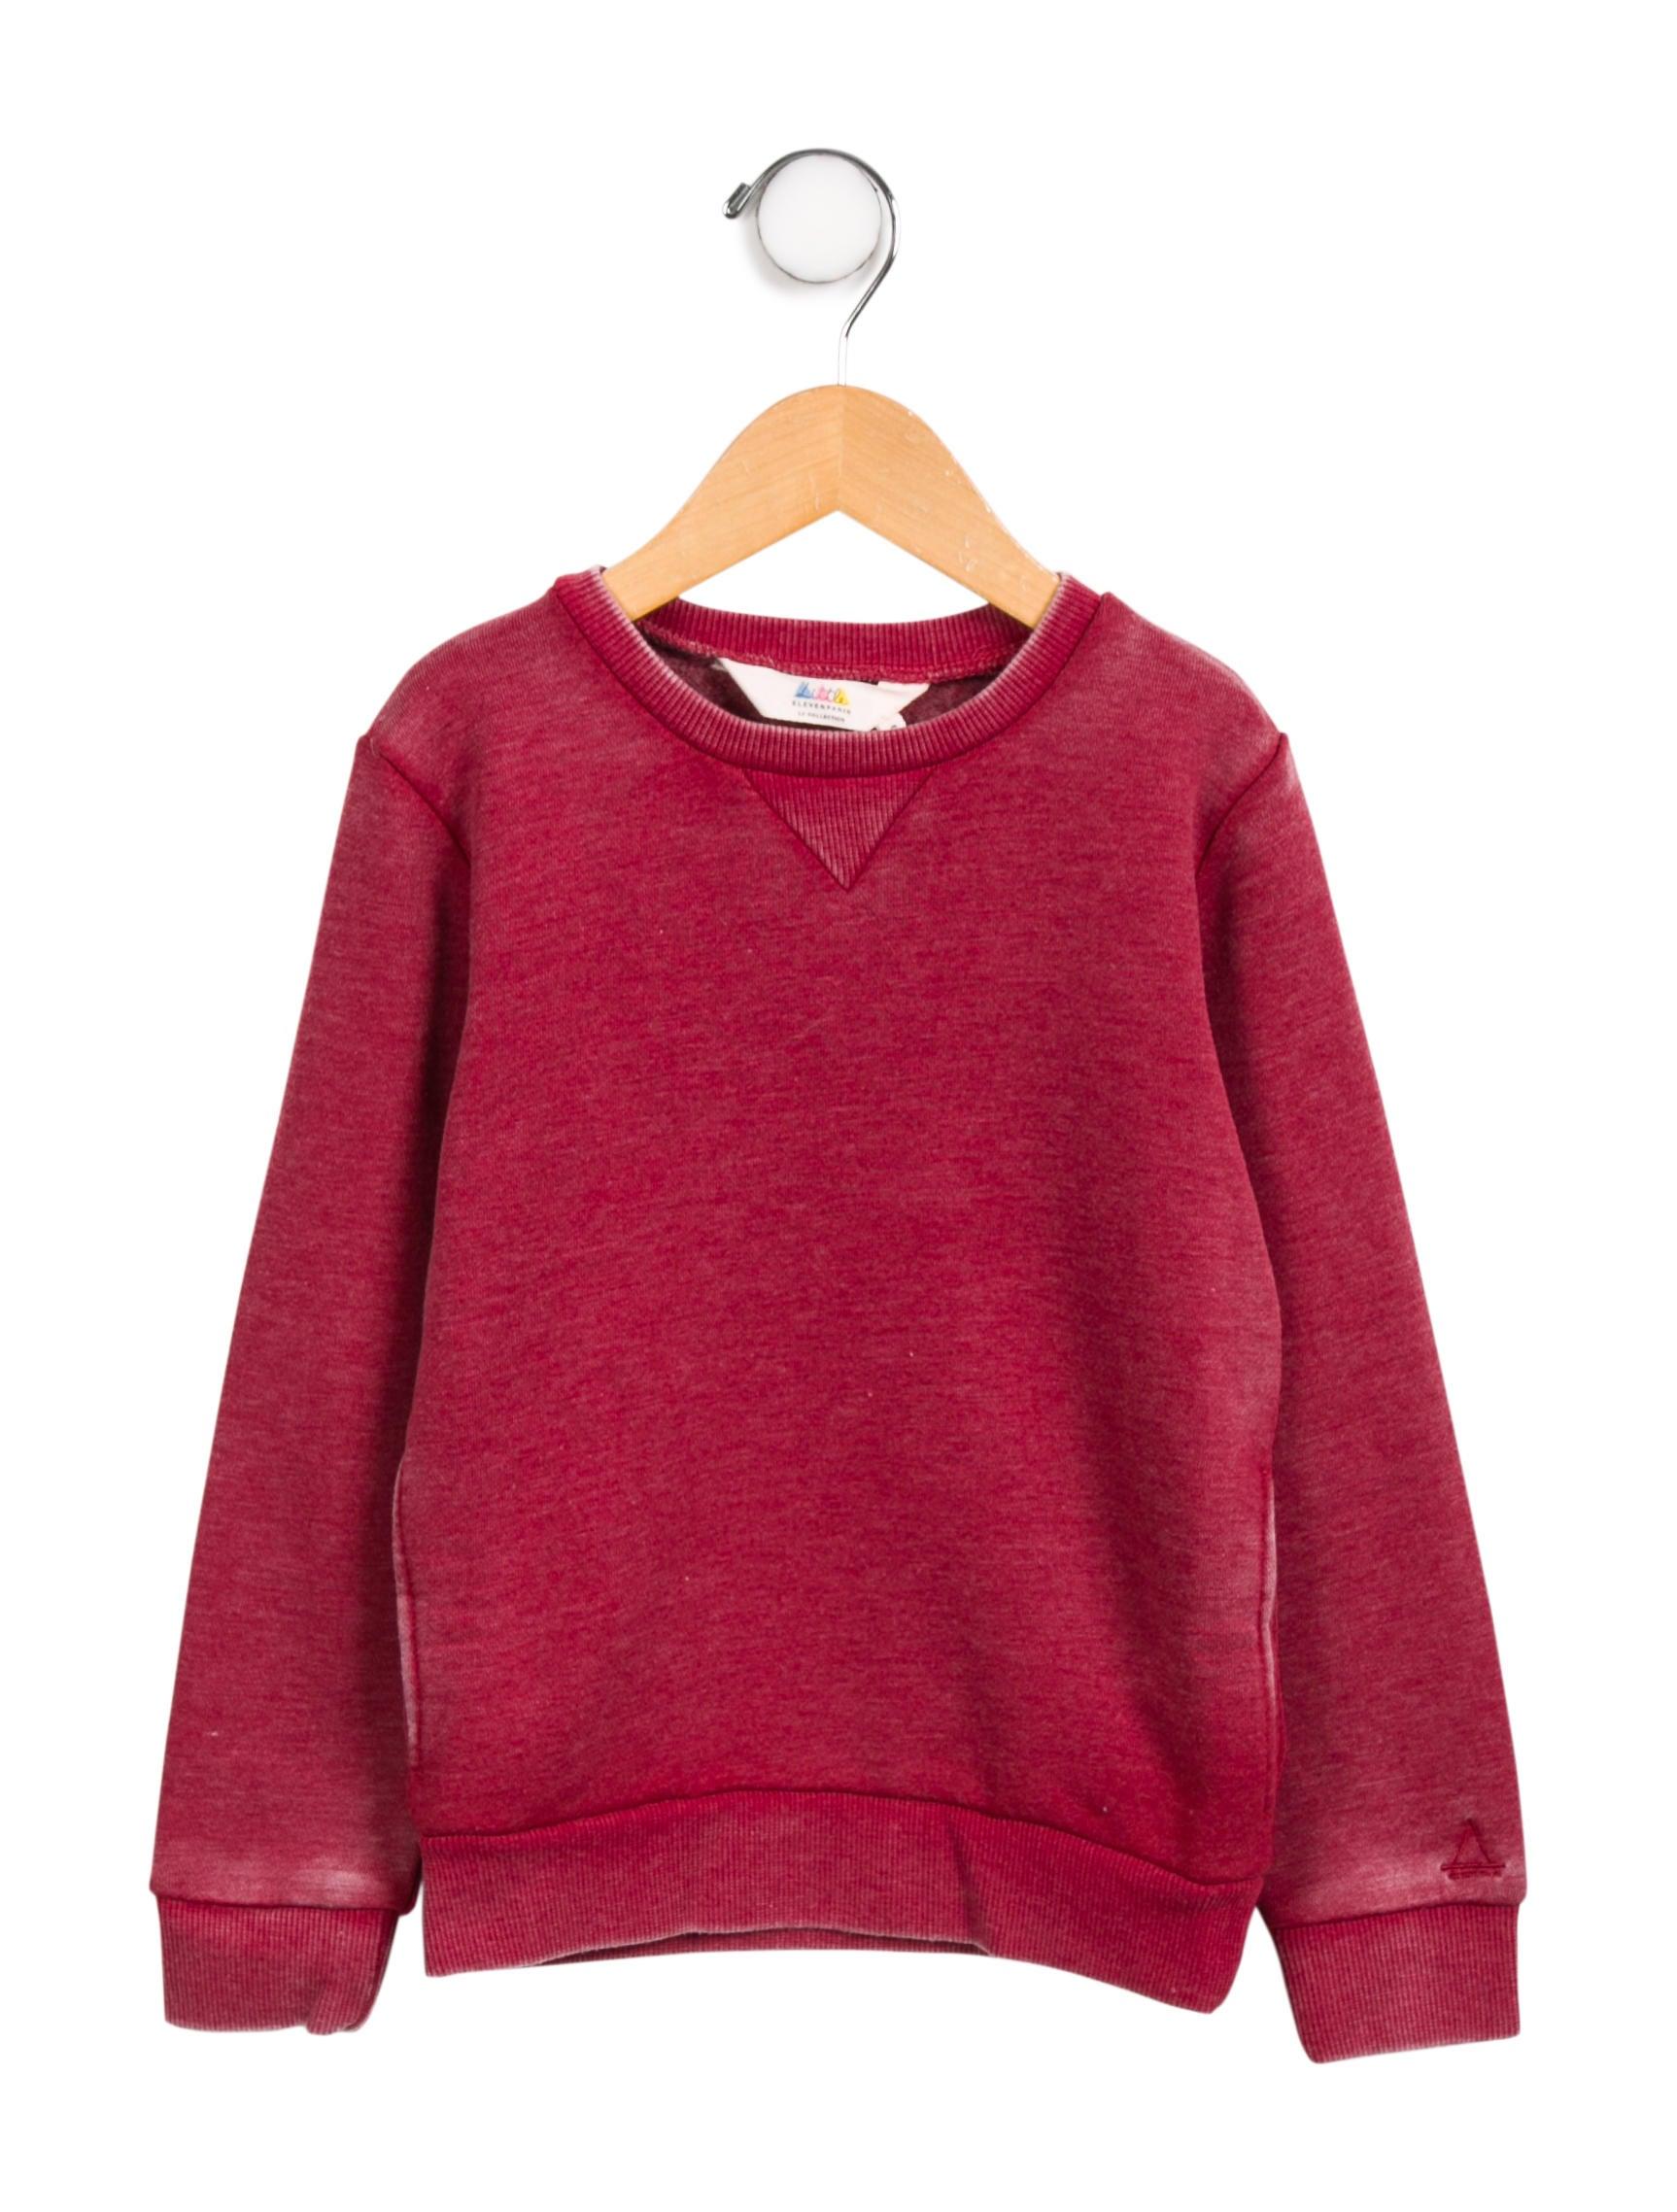 3164c3f8c71 Little Eleven Paris Boys  Distressed Long Sleeve Sweatshirt - Boys ...